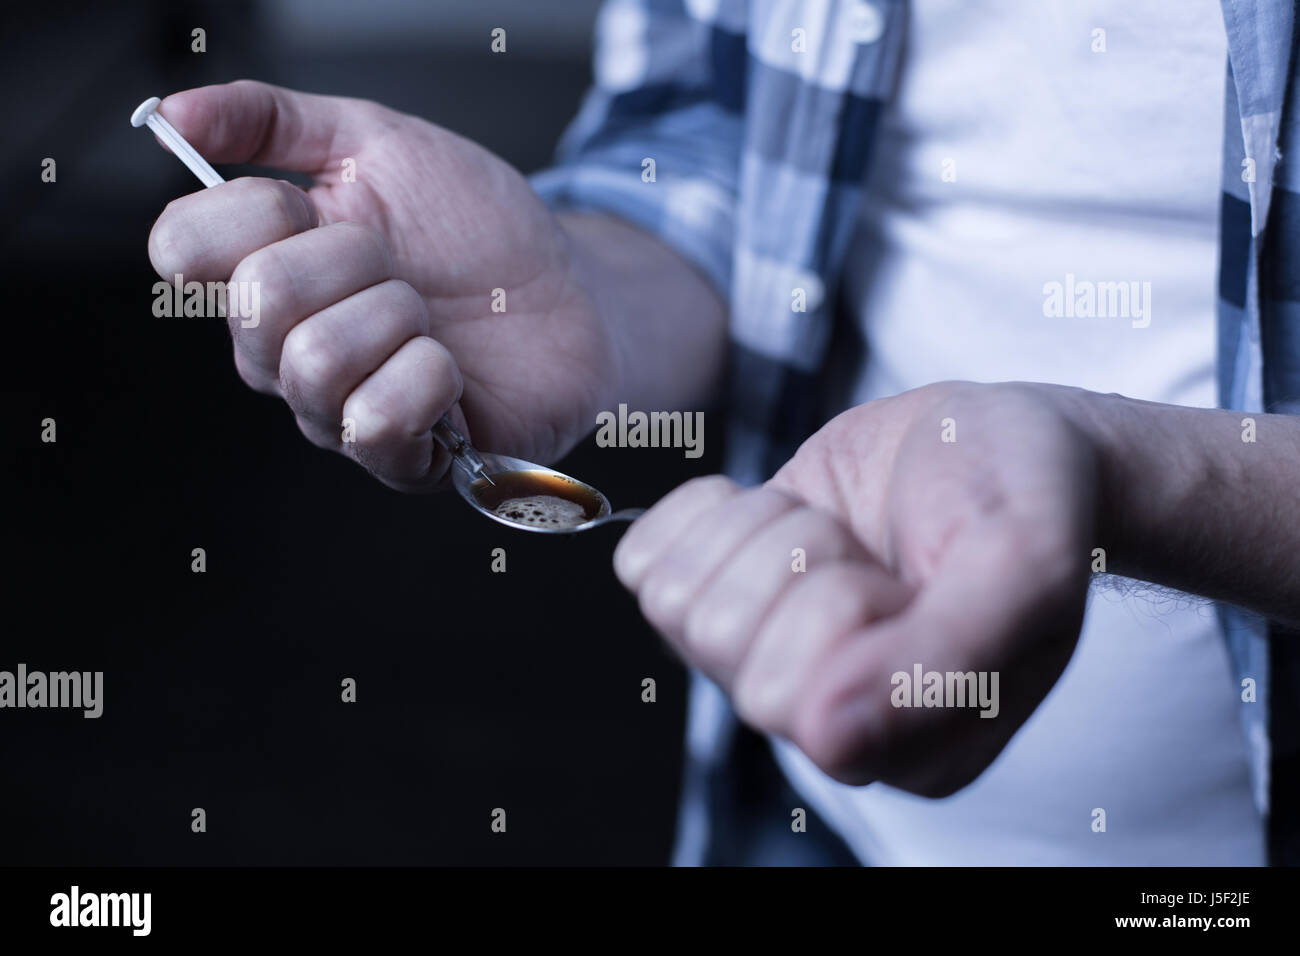 Criminal heroin addict preparing drug dose in the dark place - Stock Image